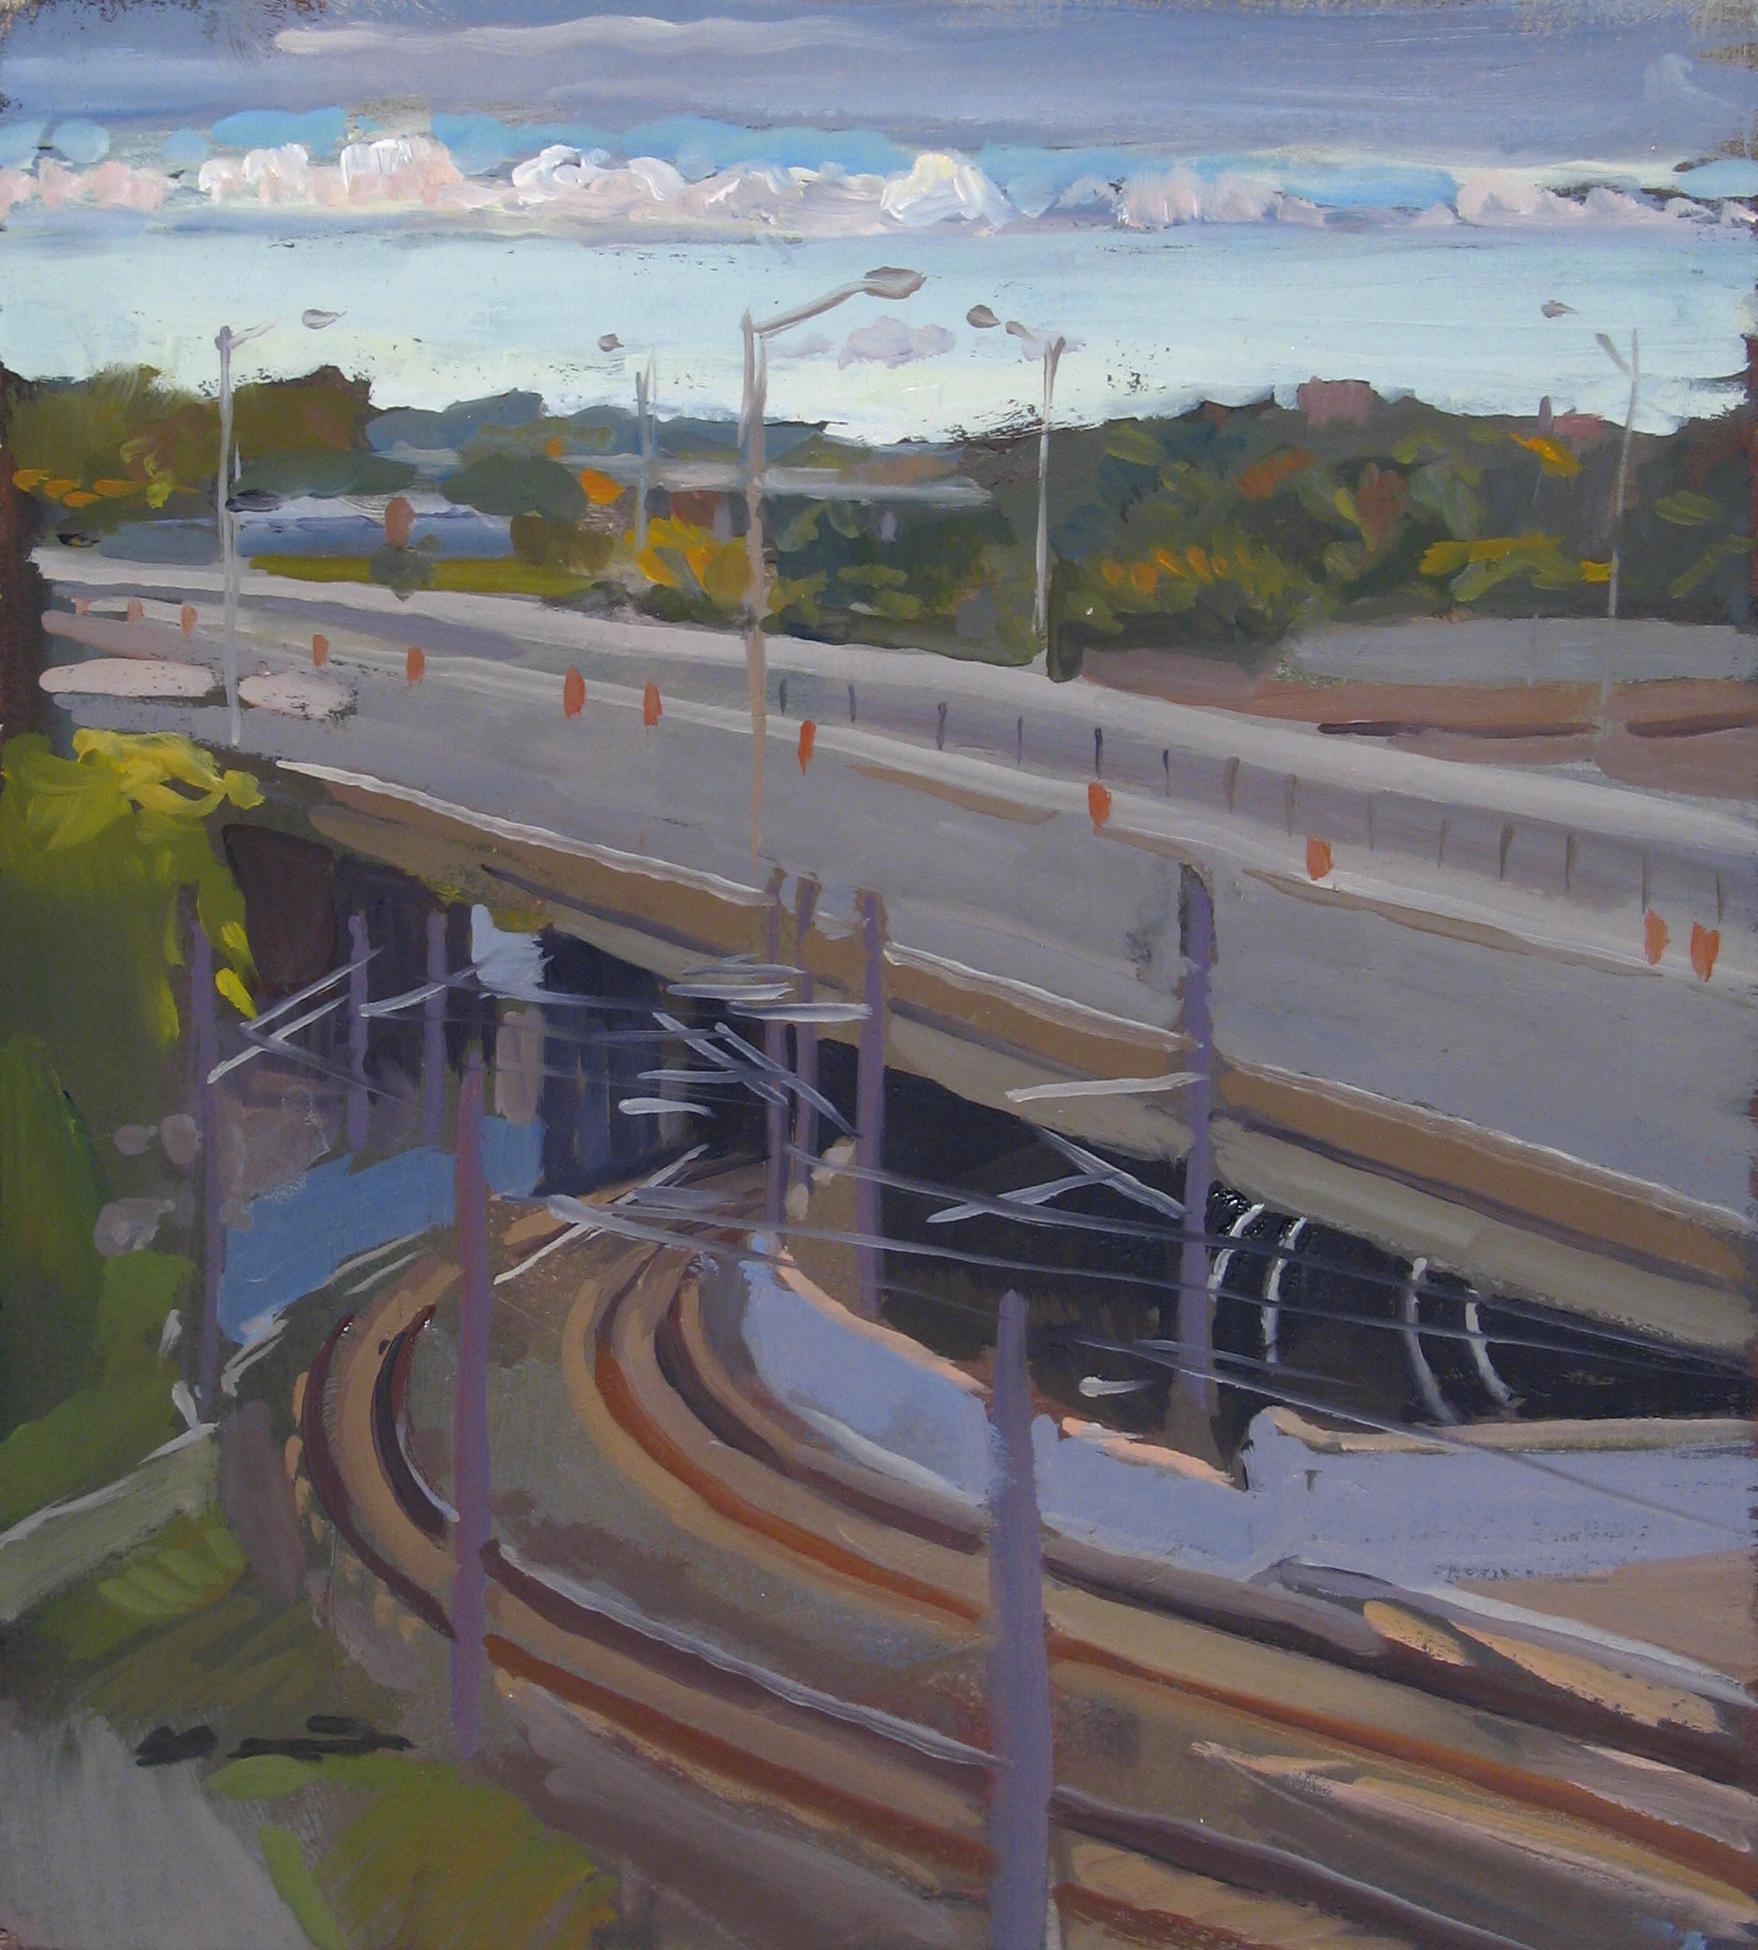 Lightrail